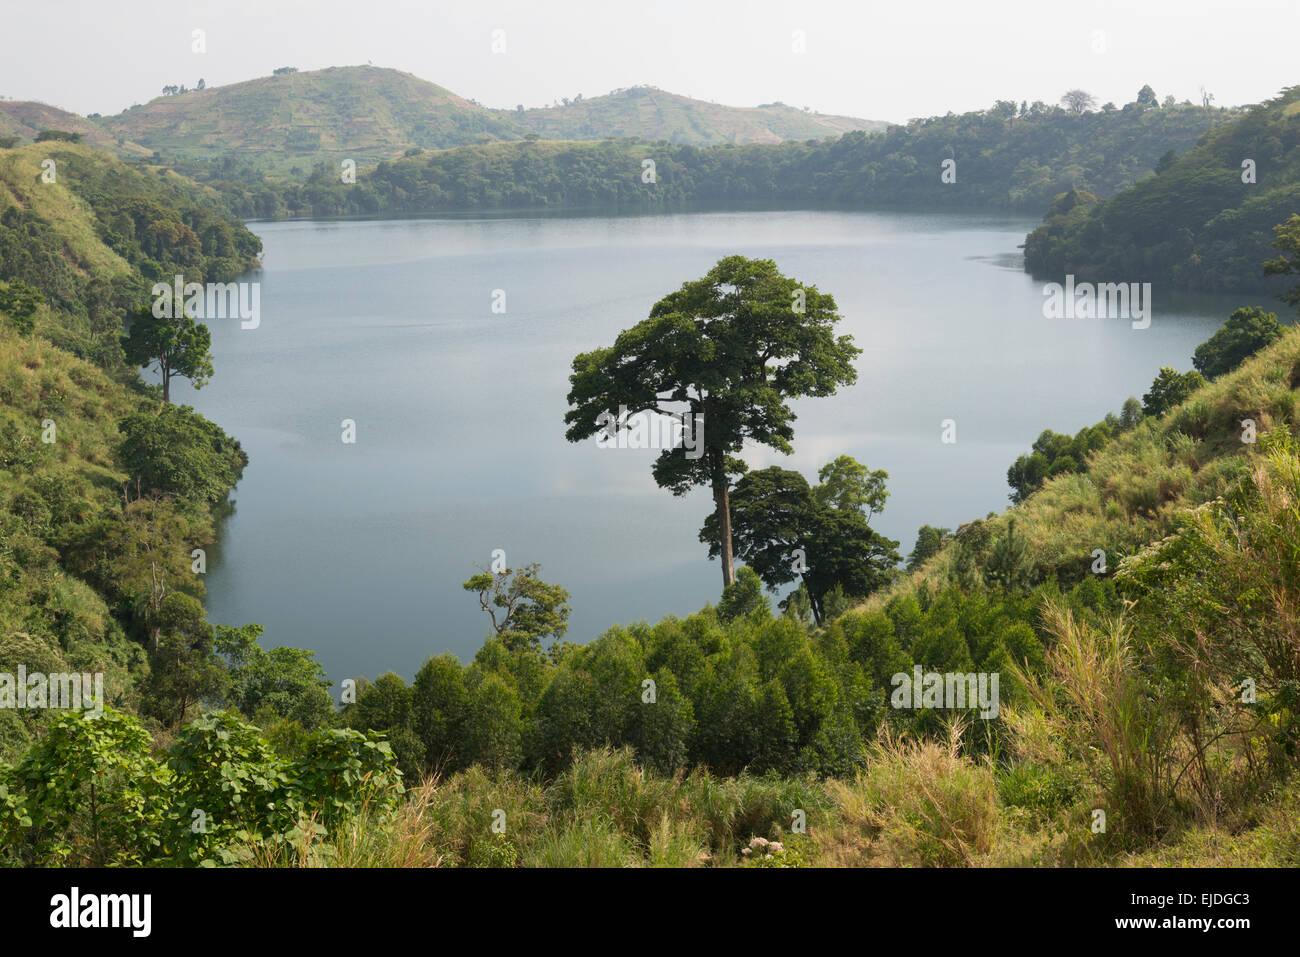 Crater lakes. Fort Portale area. Uganda. Stock Photo